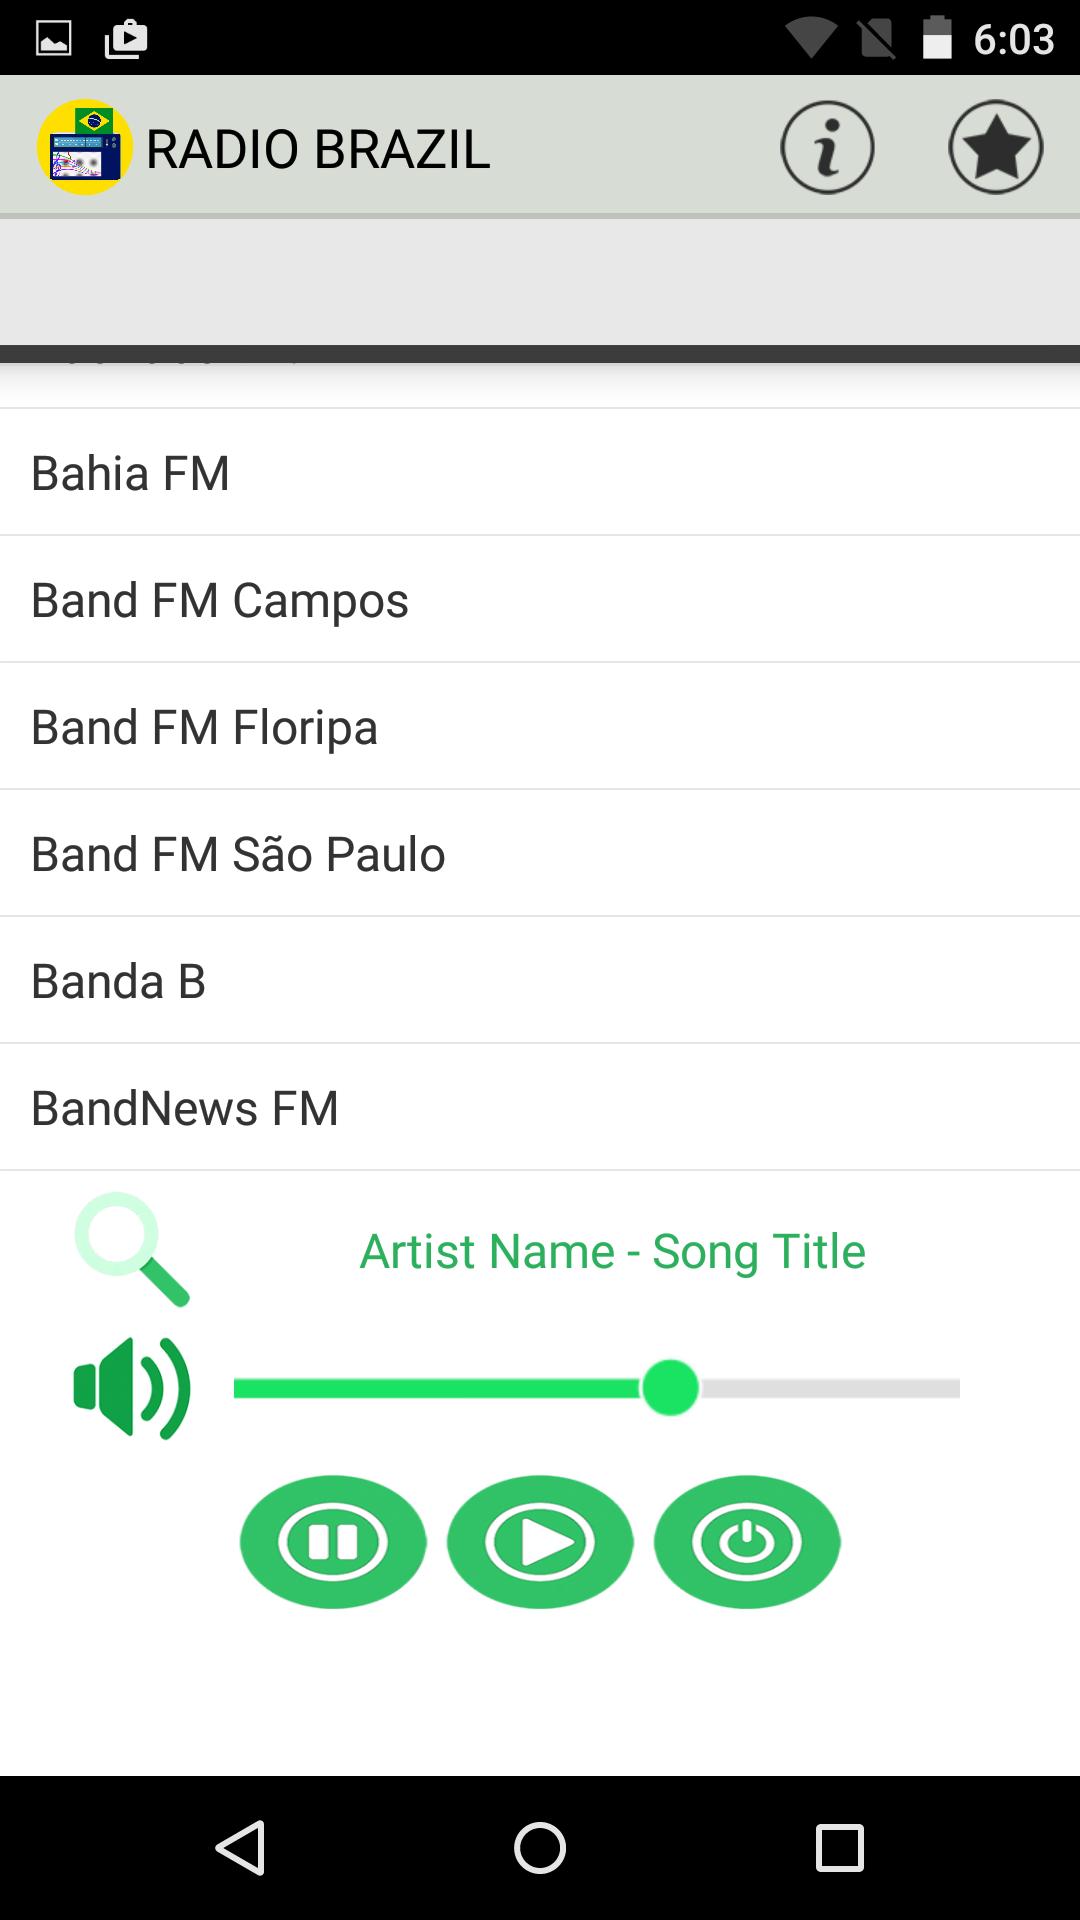 Radio banda b ouvir online dating